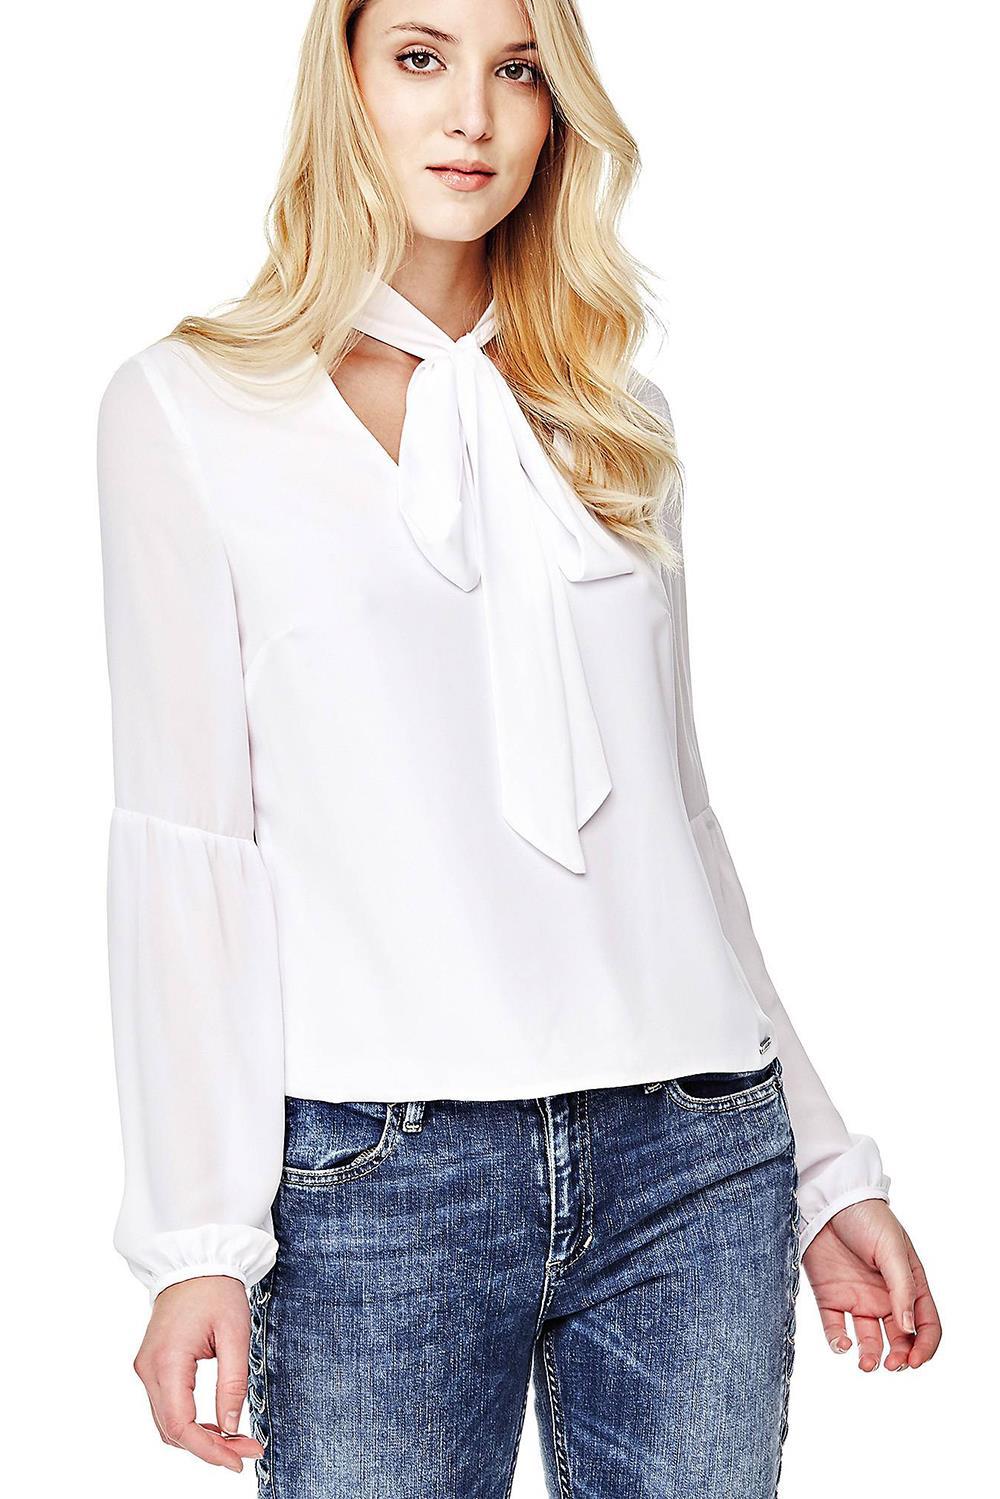 c4faaa959de4 20 camisas blancas de mujer: Zara, Mango, Massimo Duti, Pull and Bear